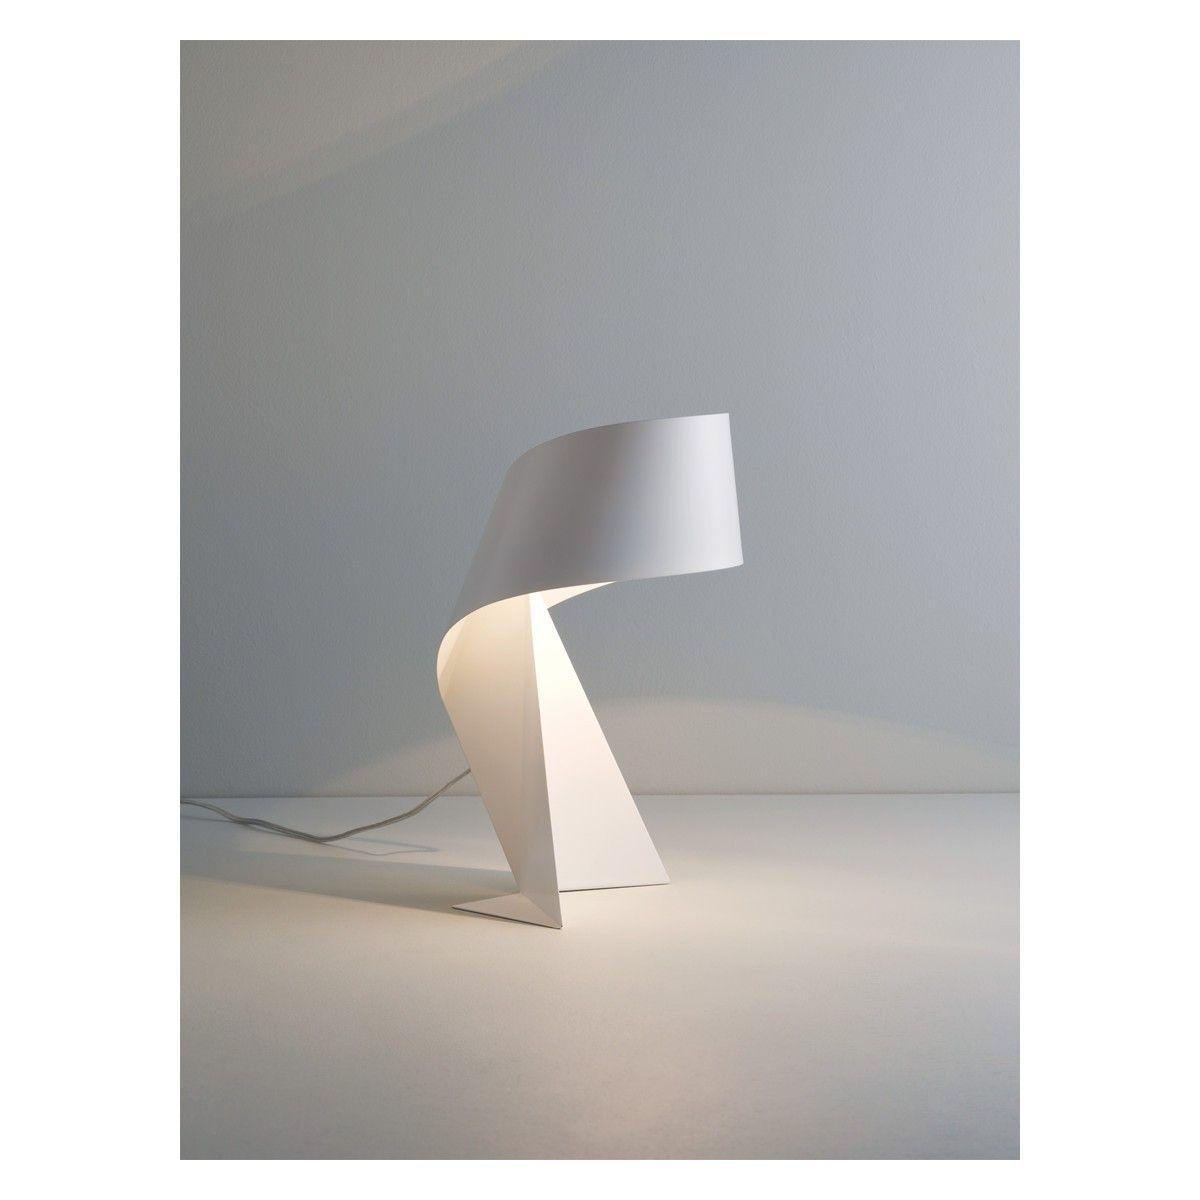 RIBBON White small metal table lamp | Home | Pinterest | Metal ...